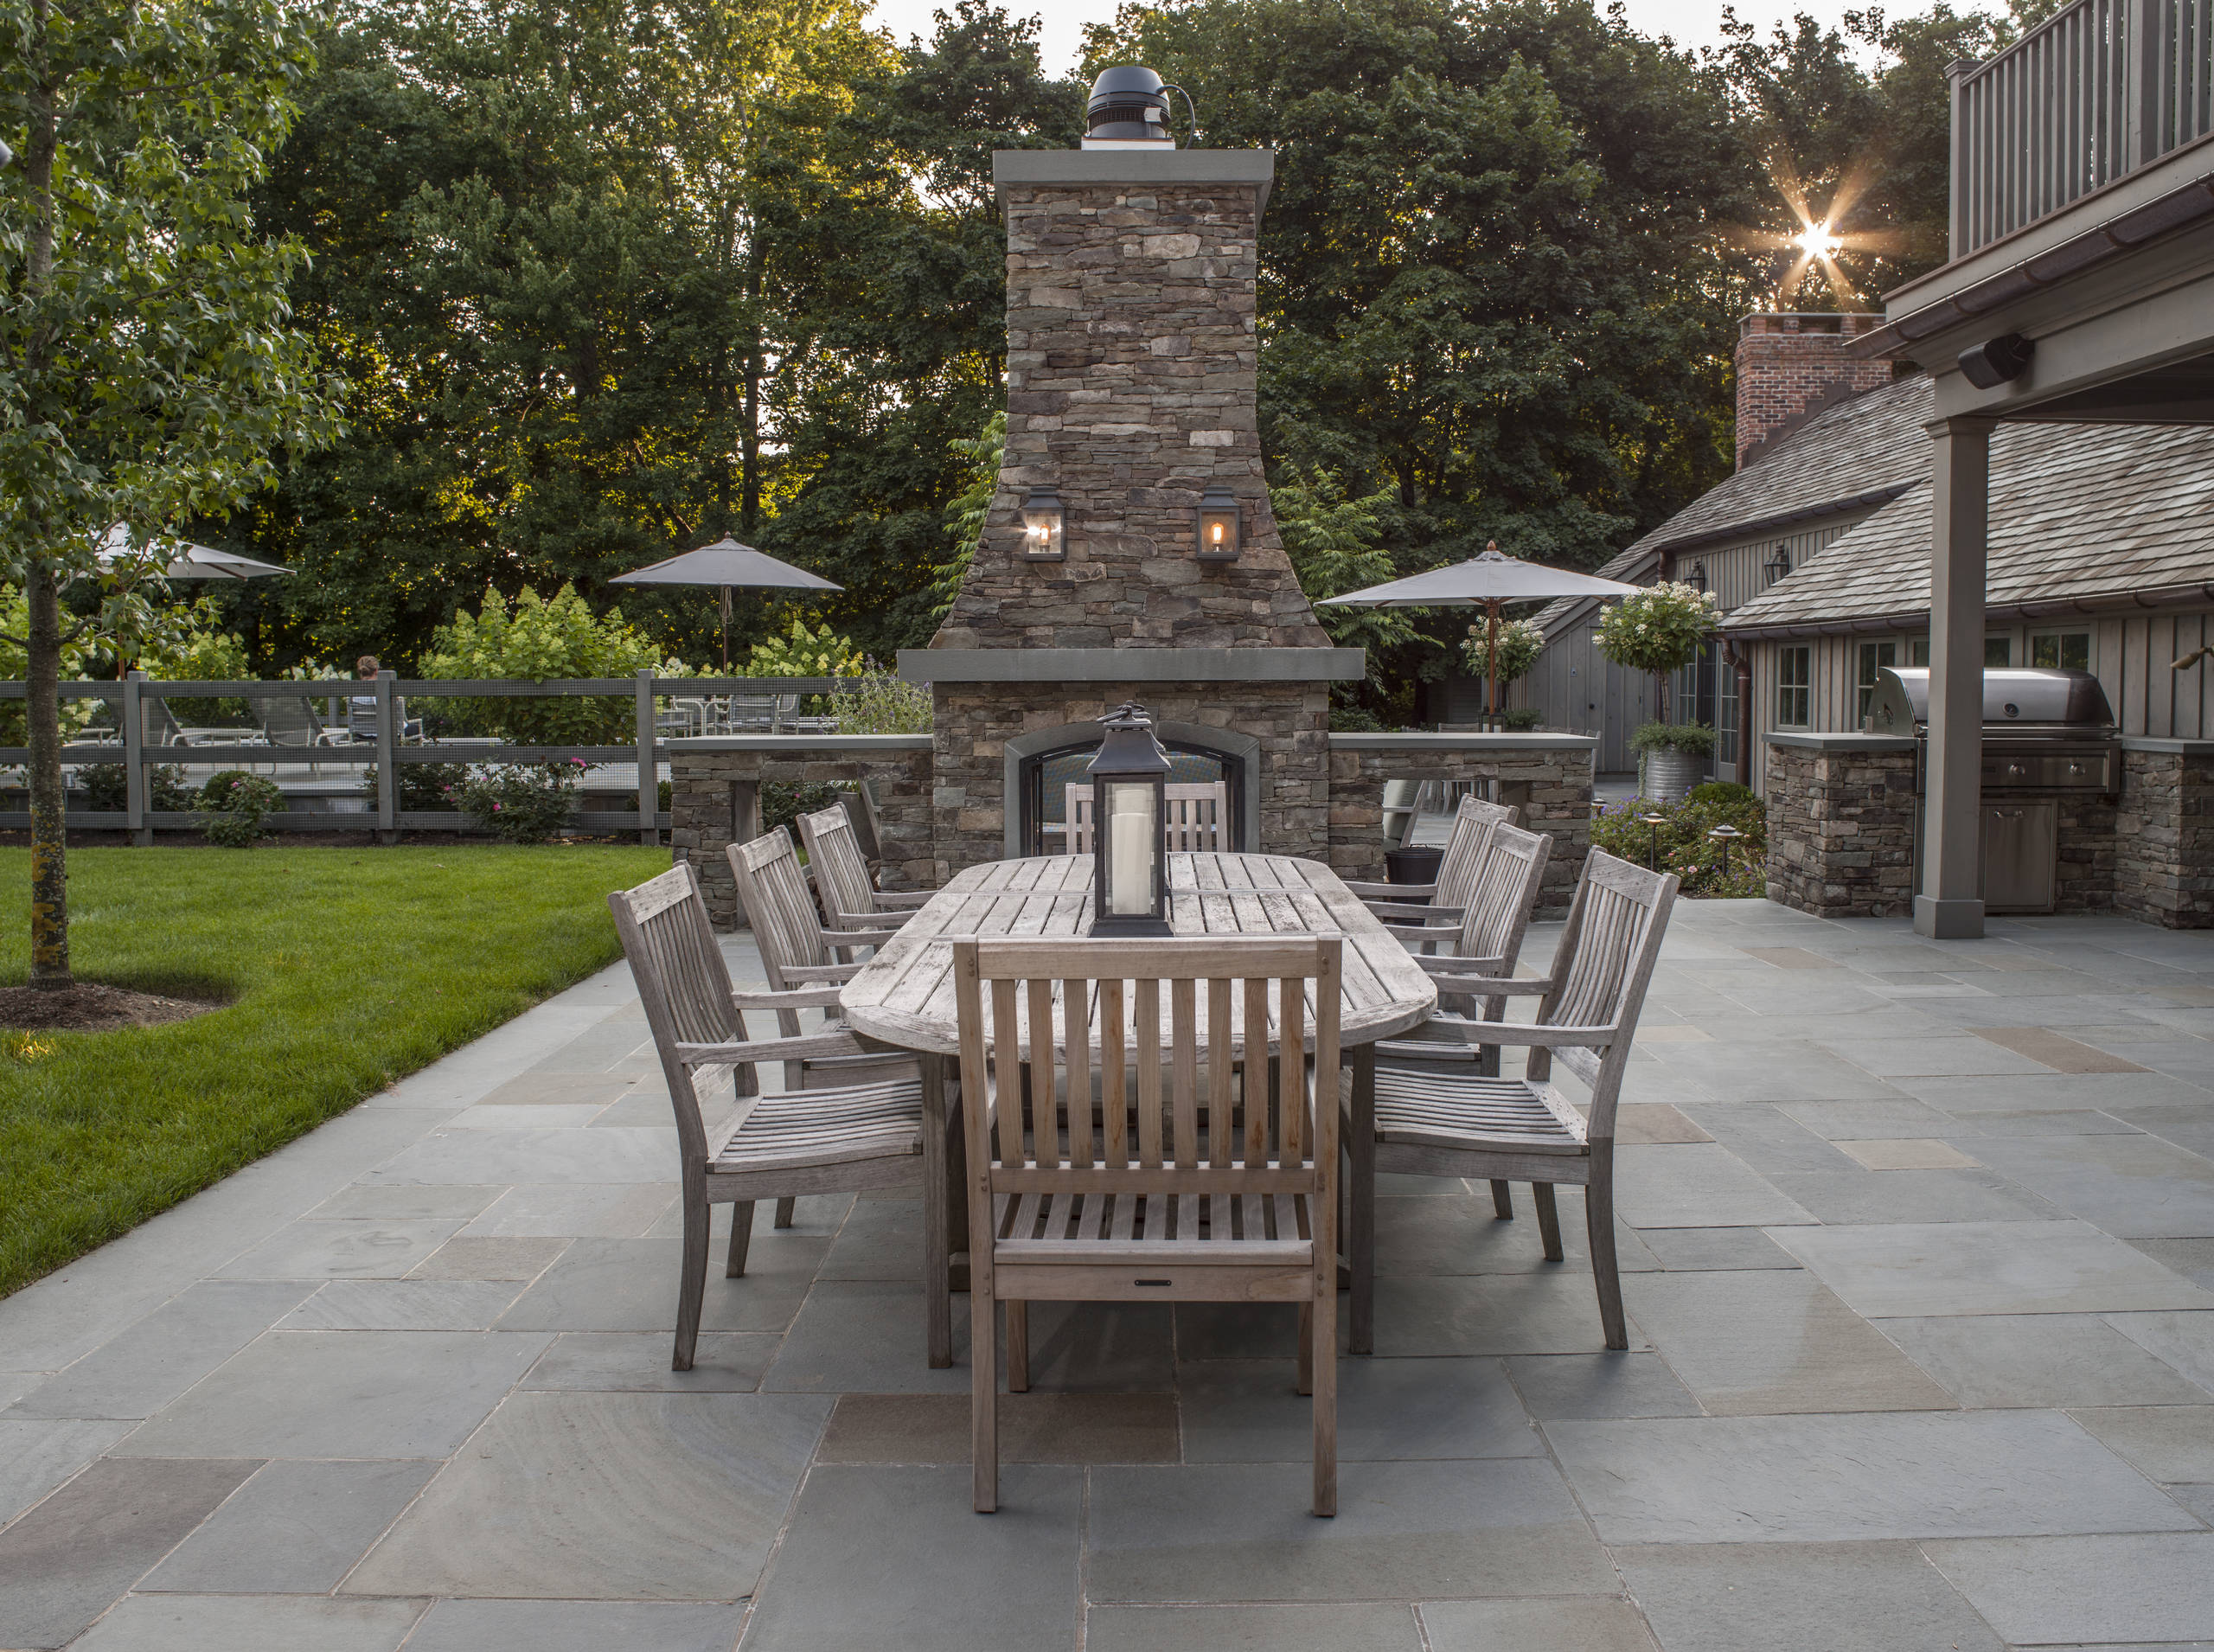 Eye-catching-paving.-2 100+ Surprising Garden Design Ideas You Should Not Miss in 2021